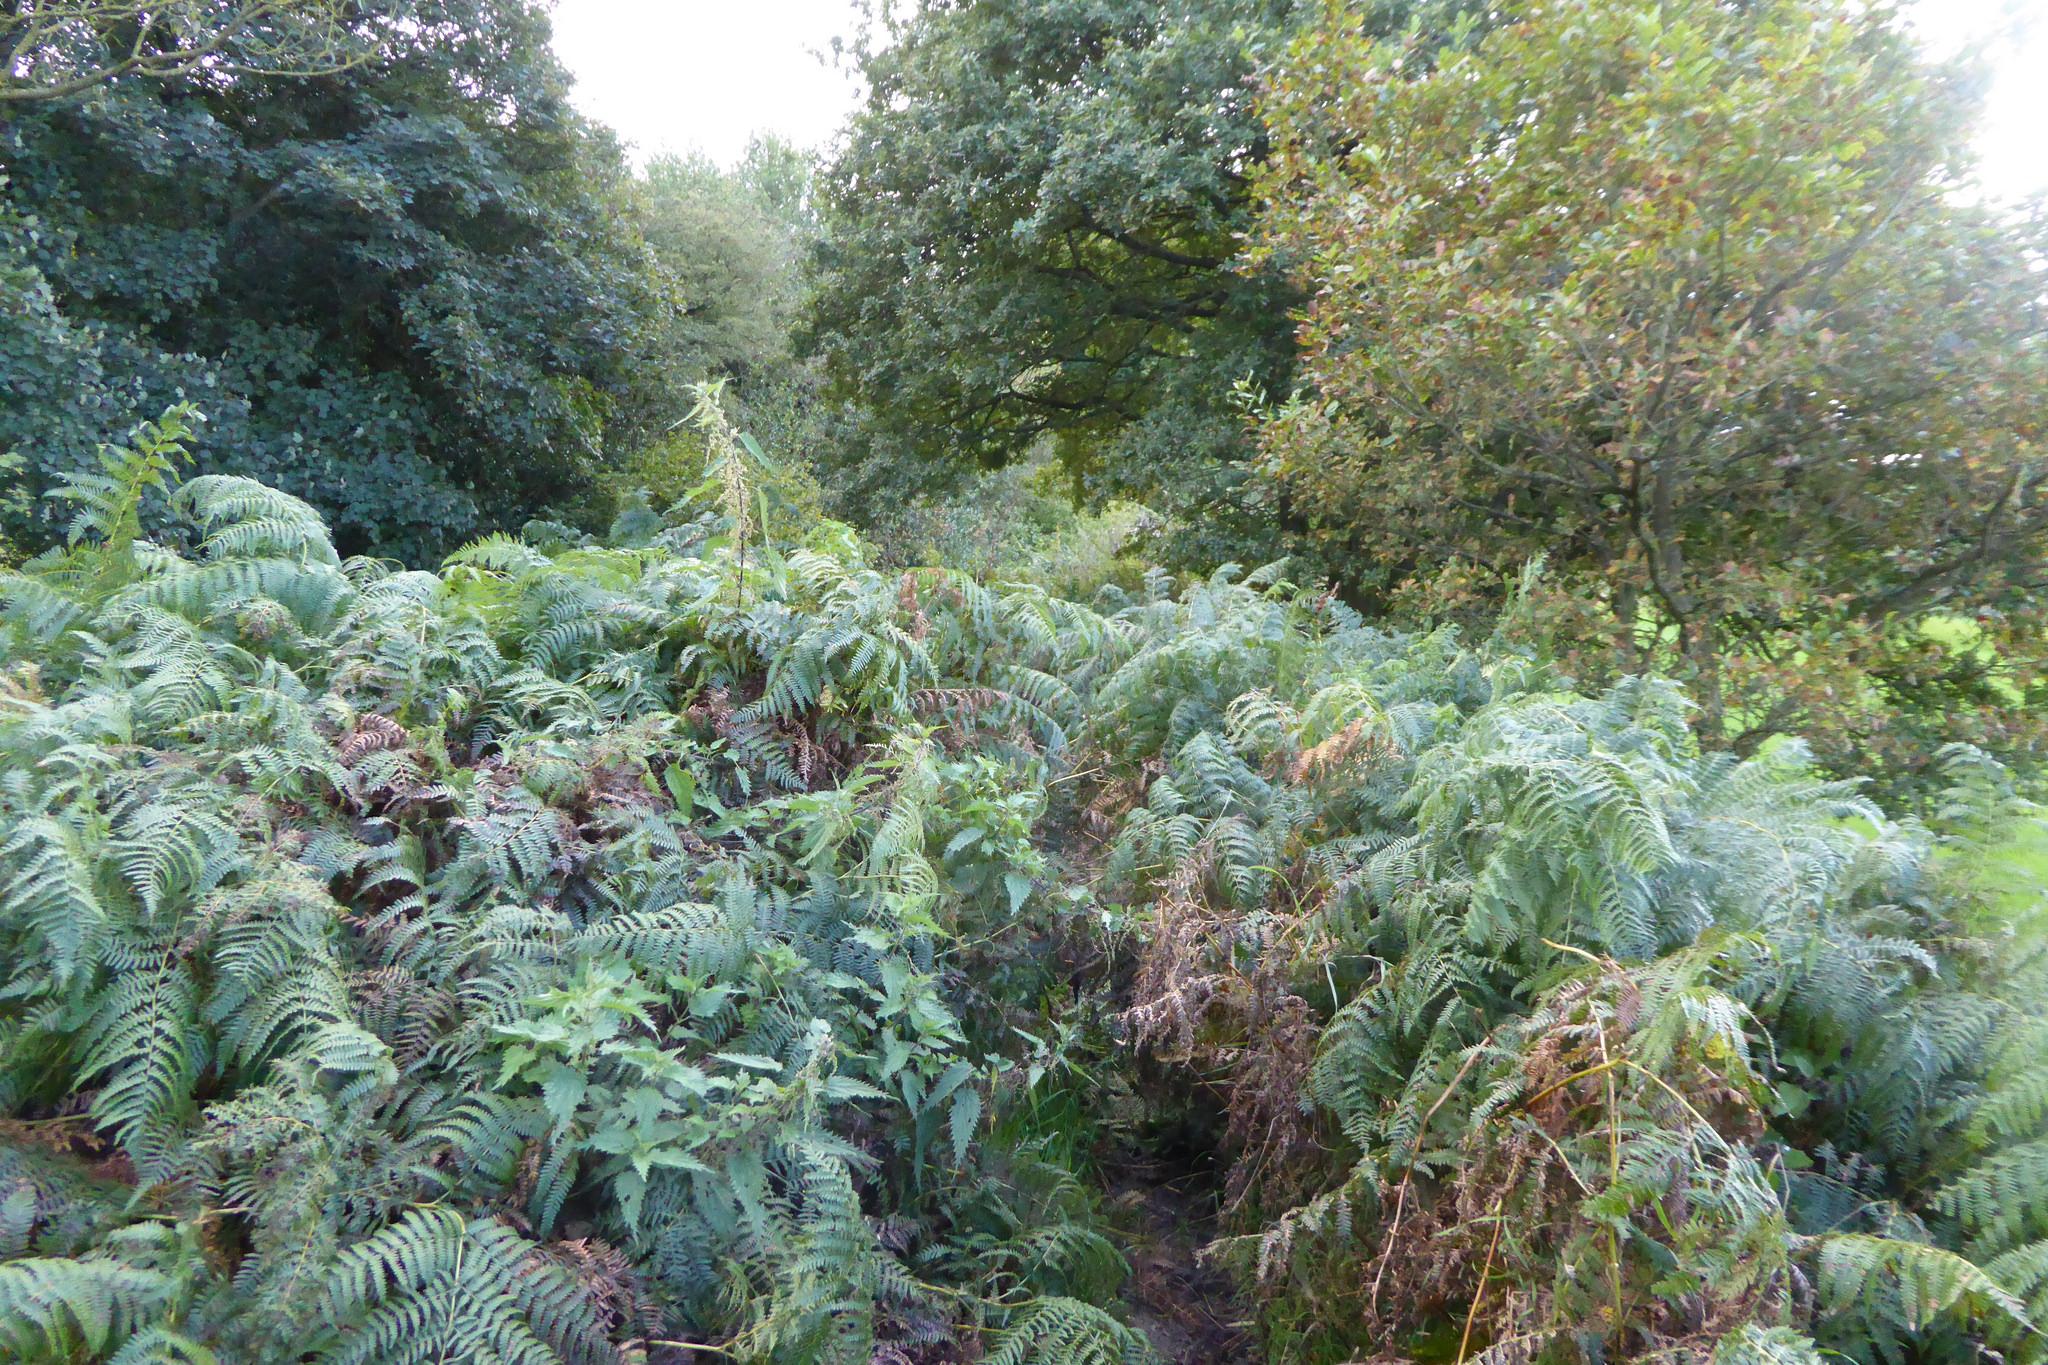 A bracken covered path